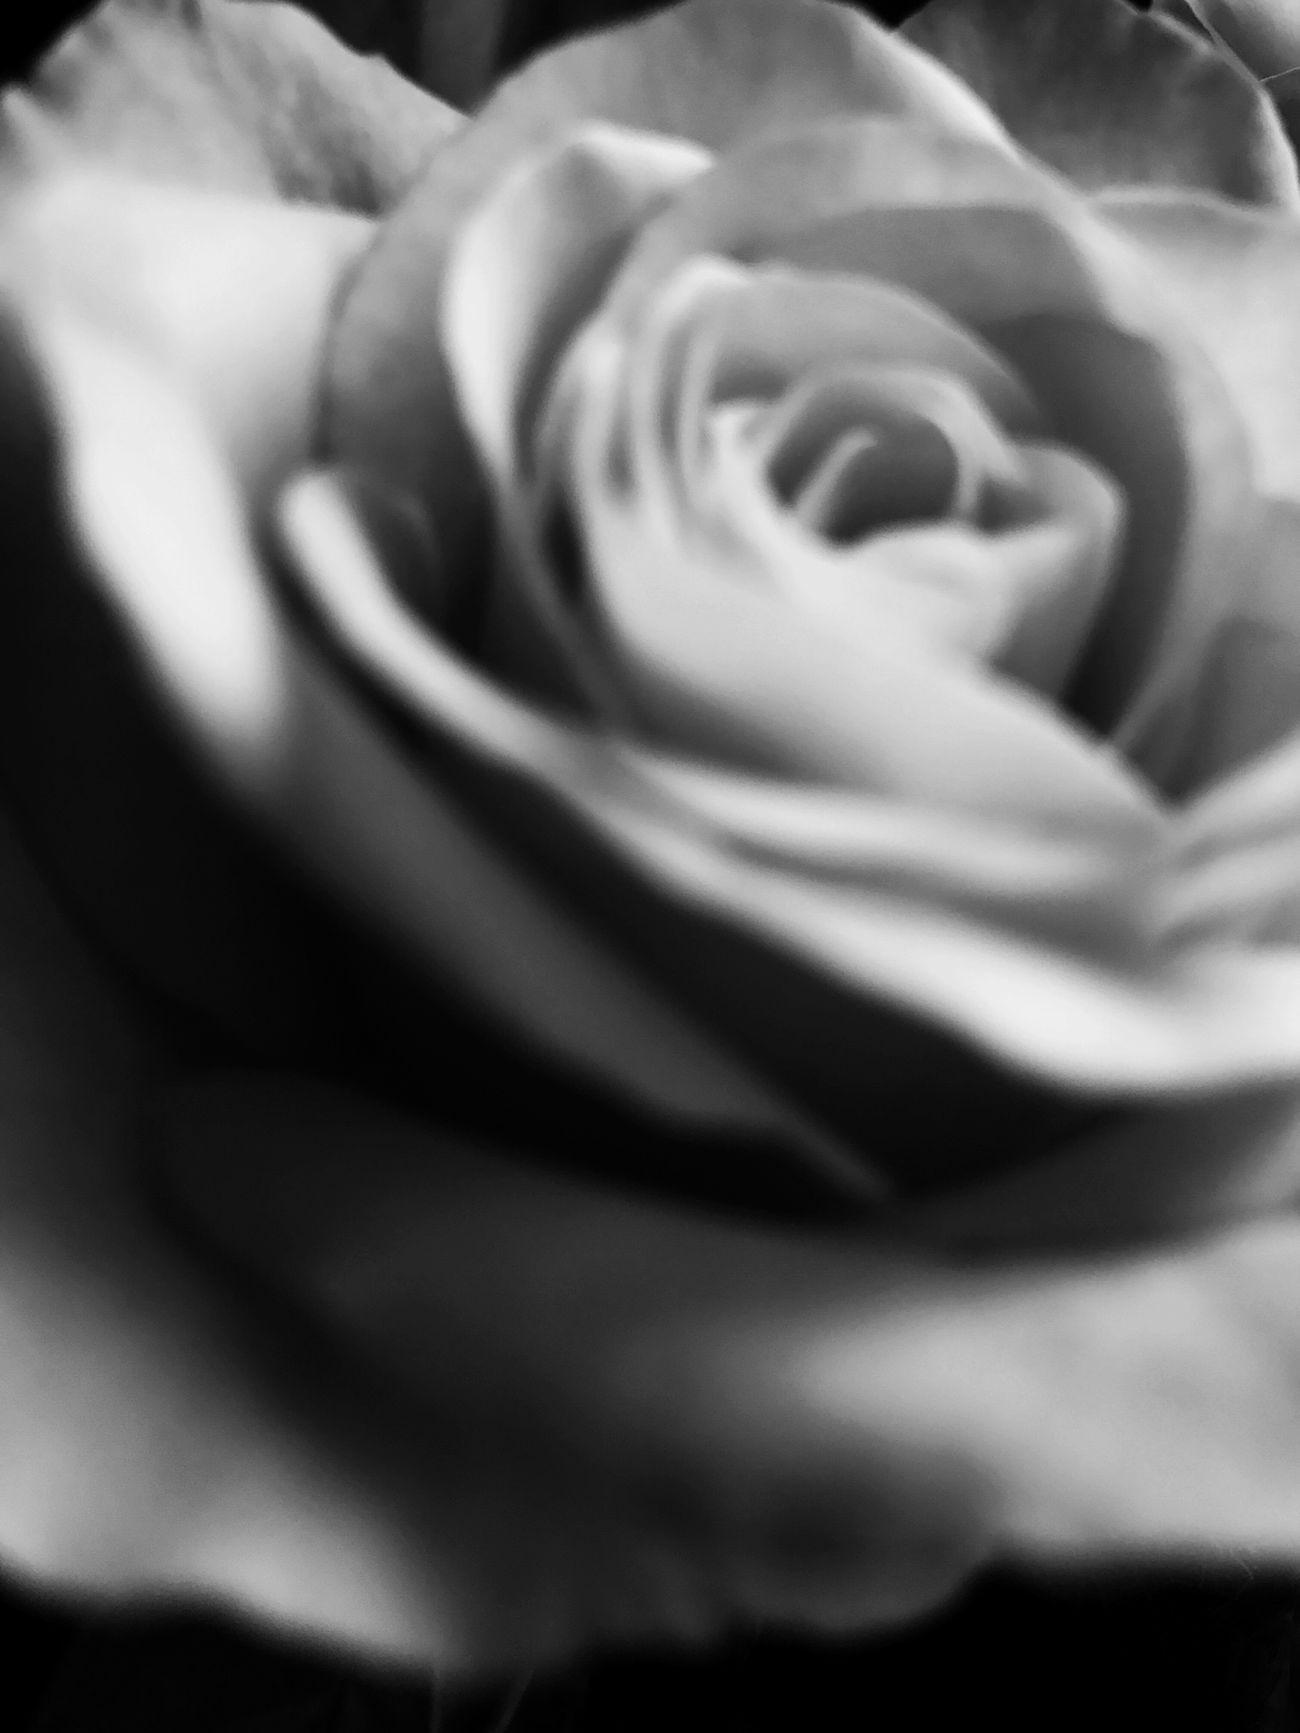 Rosé Blackandwhite Black And White Black & White Monochrome Macro Soft Focus